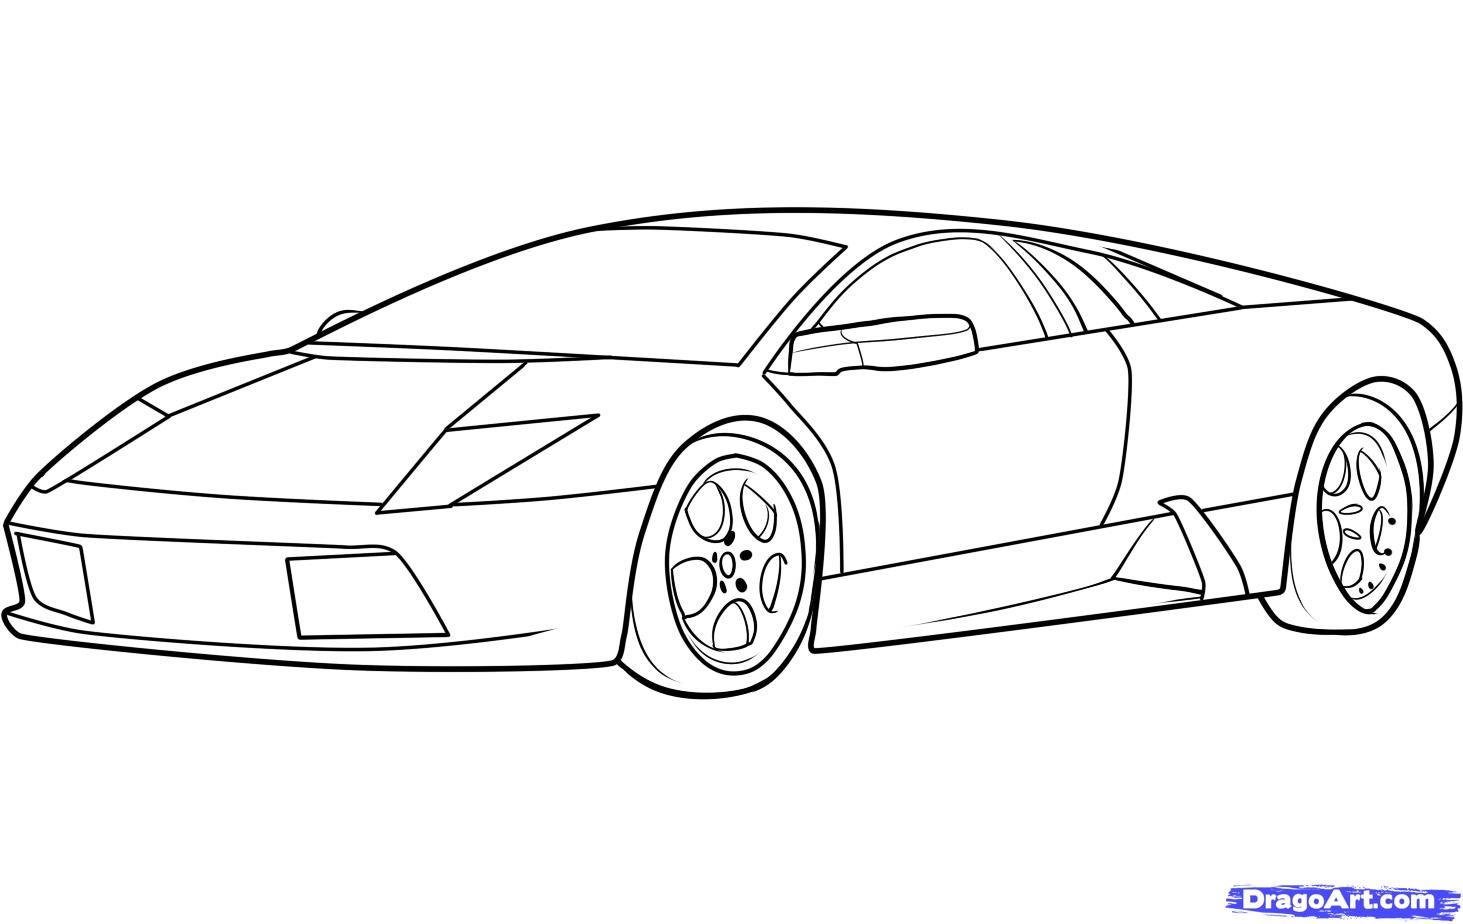 How To Draw Lamborghini Drawings